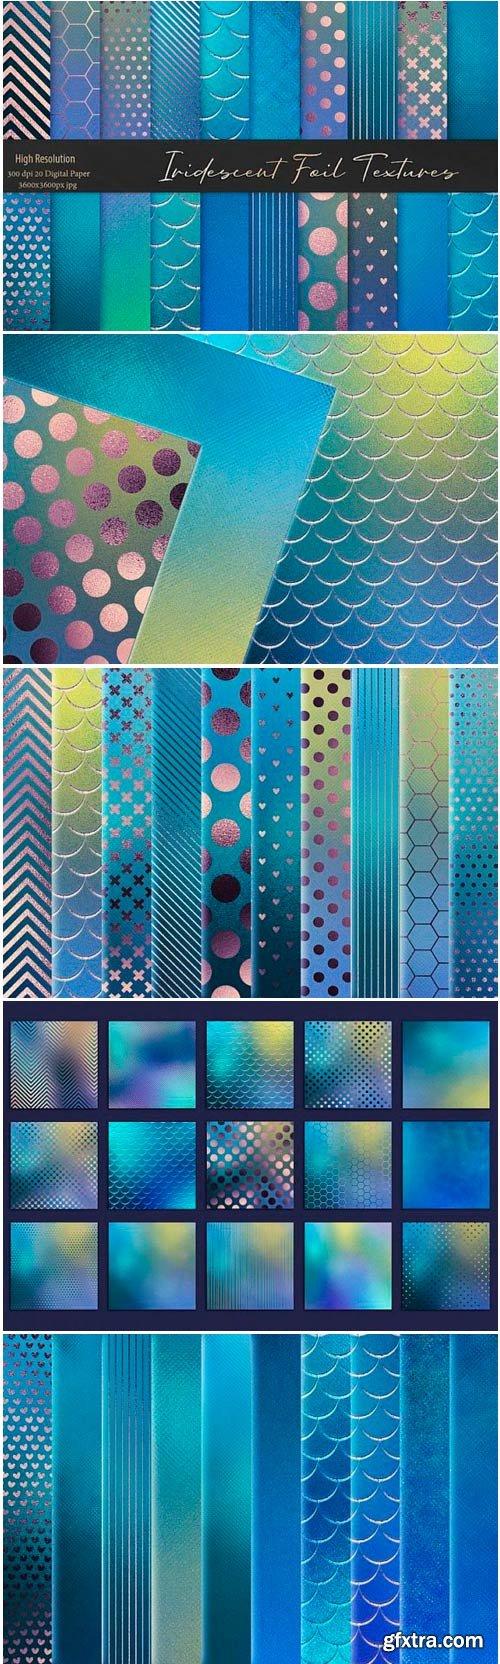 Iridescent Blue Foil Textures 1502892